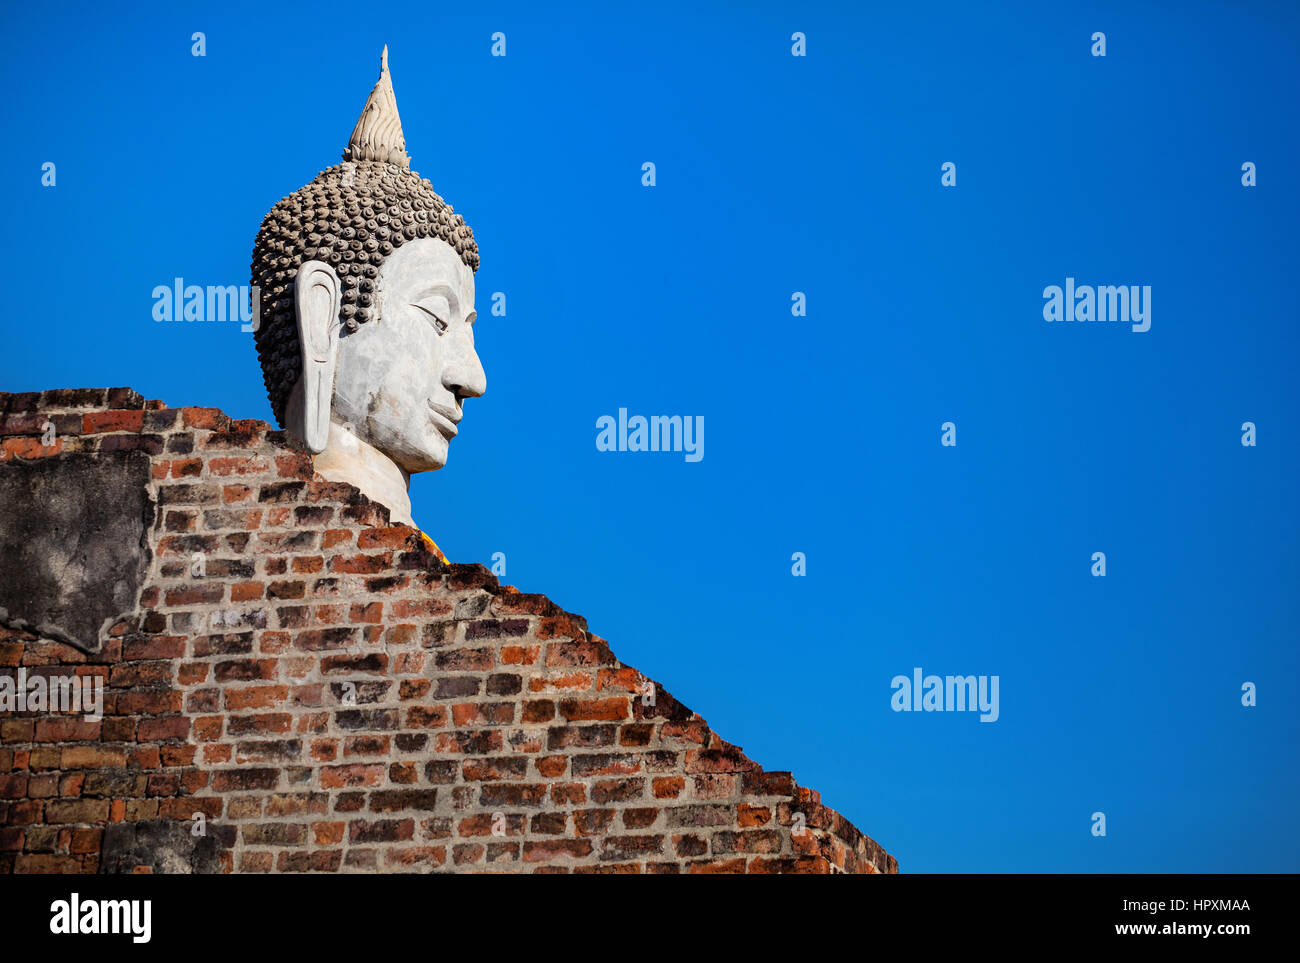 Big Buddha statue in Wat Yai Chai Mongkol monastery at blue sky in Ayuttaya, Thailand - Stock Image